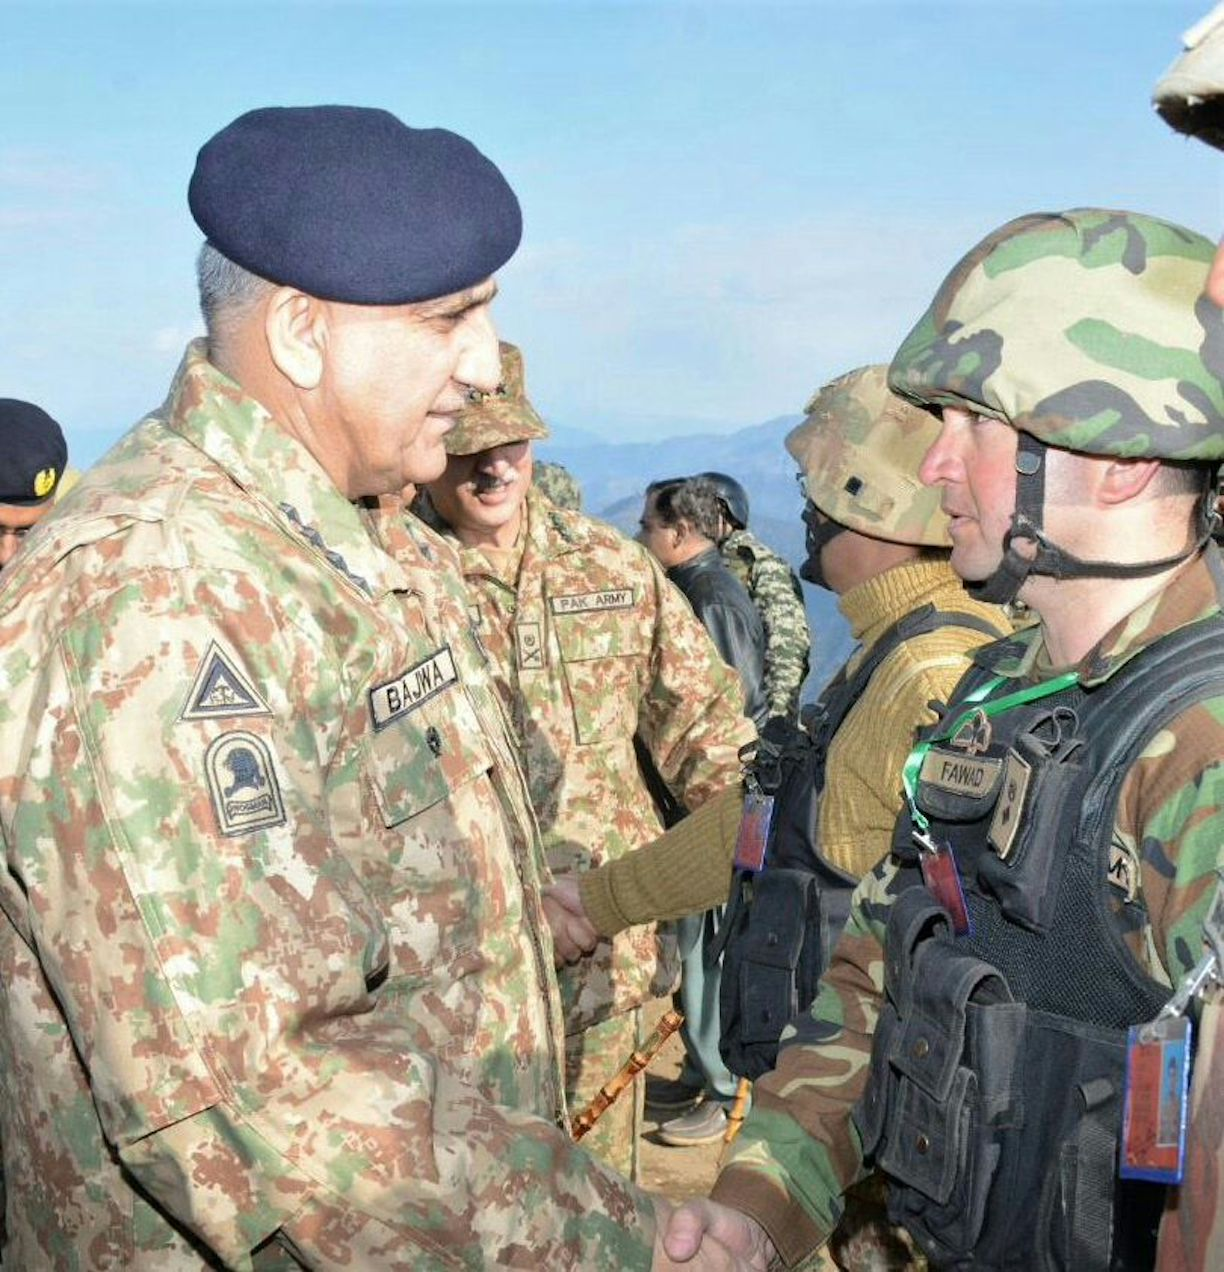 Bajwa praises troops, ulema for efforts securing peace